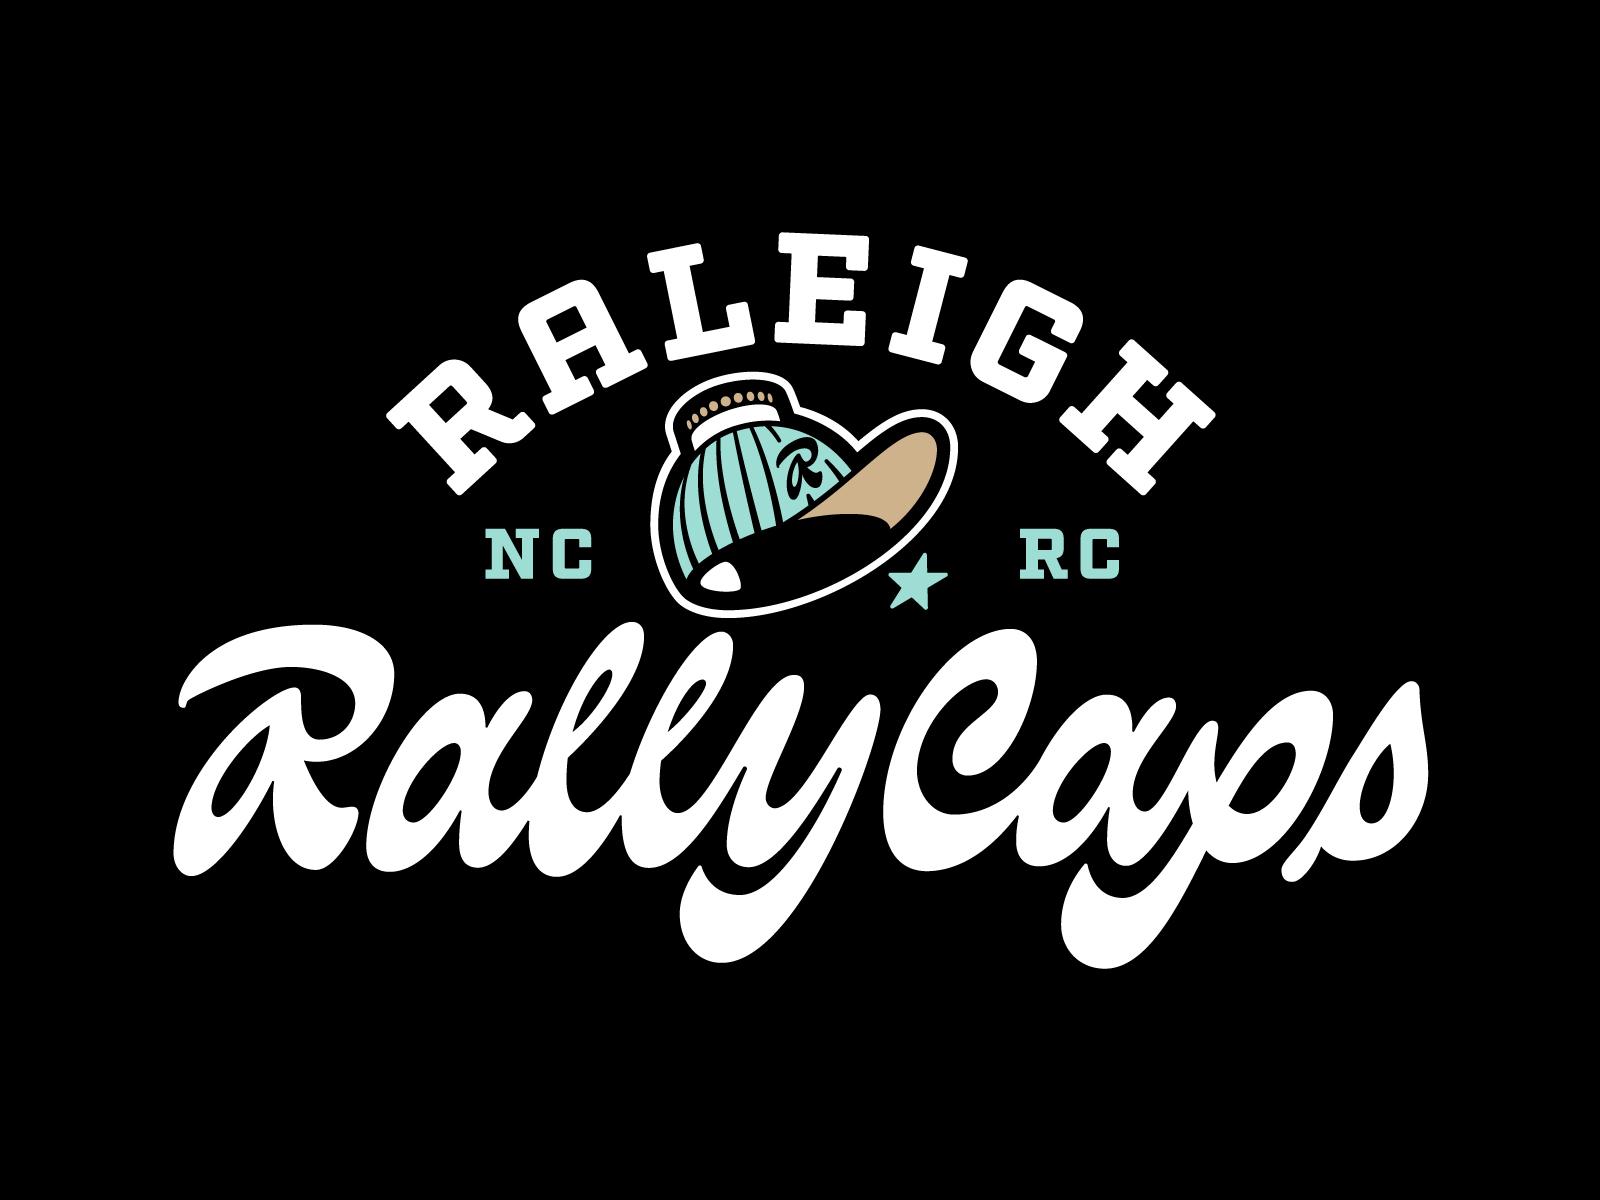 Mlbr rallycaps 08